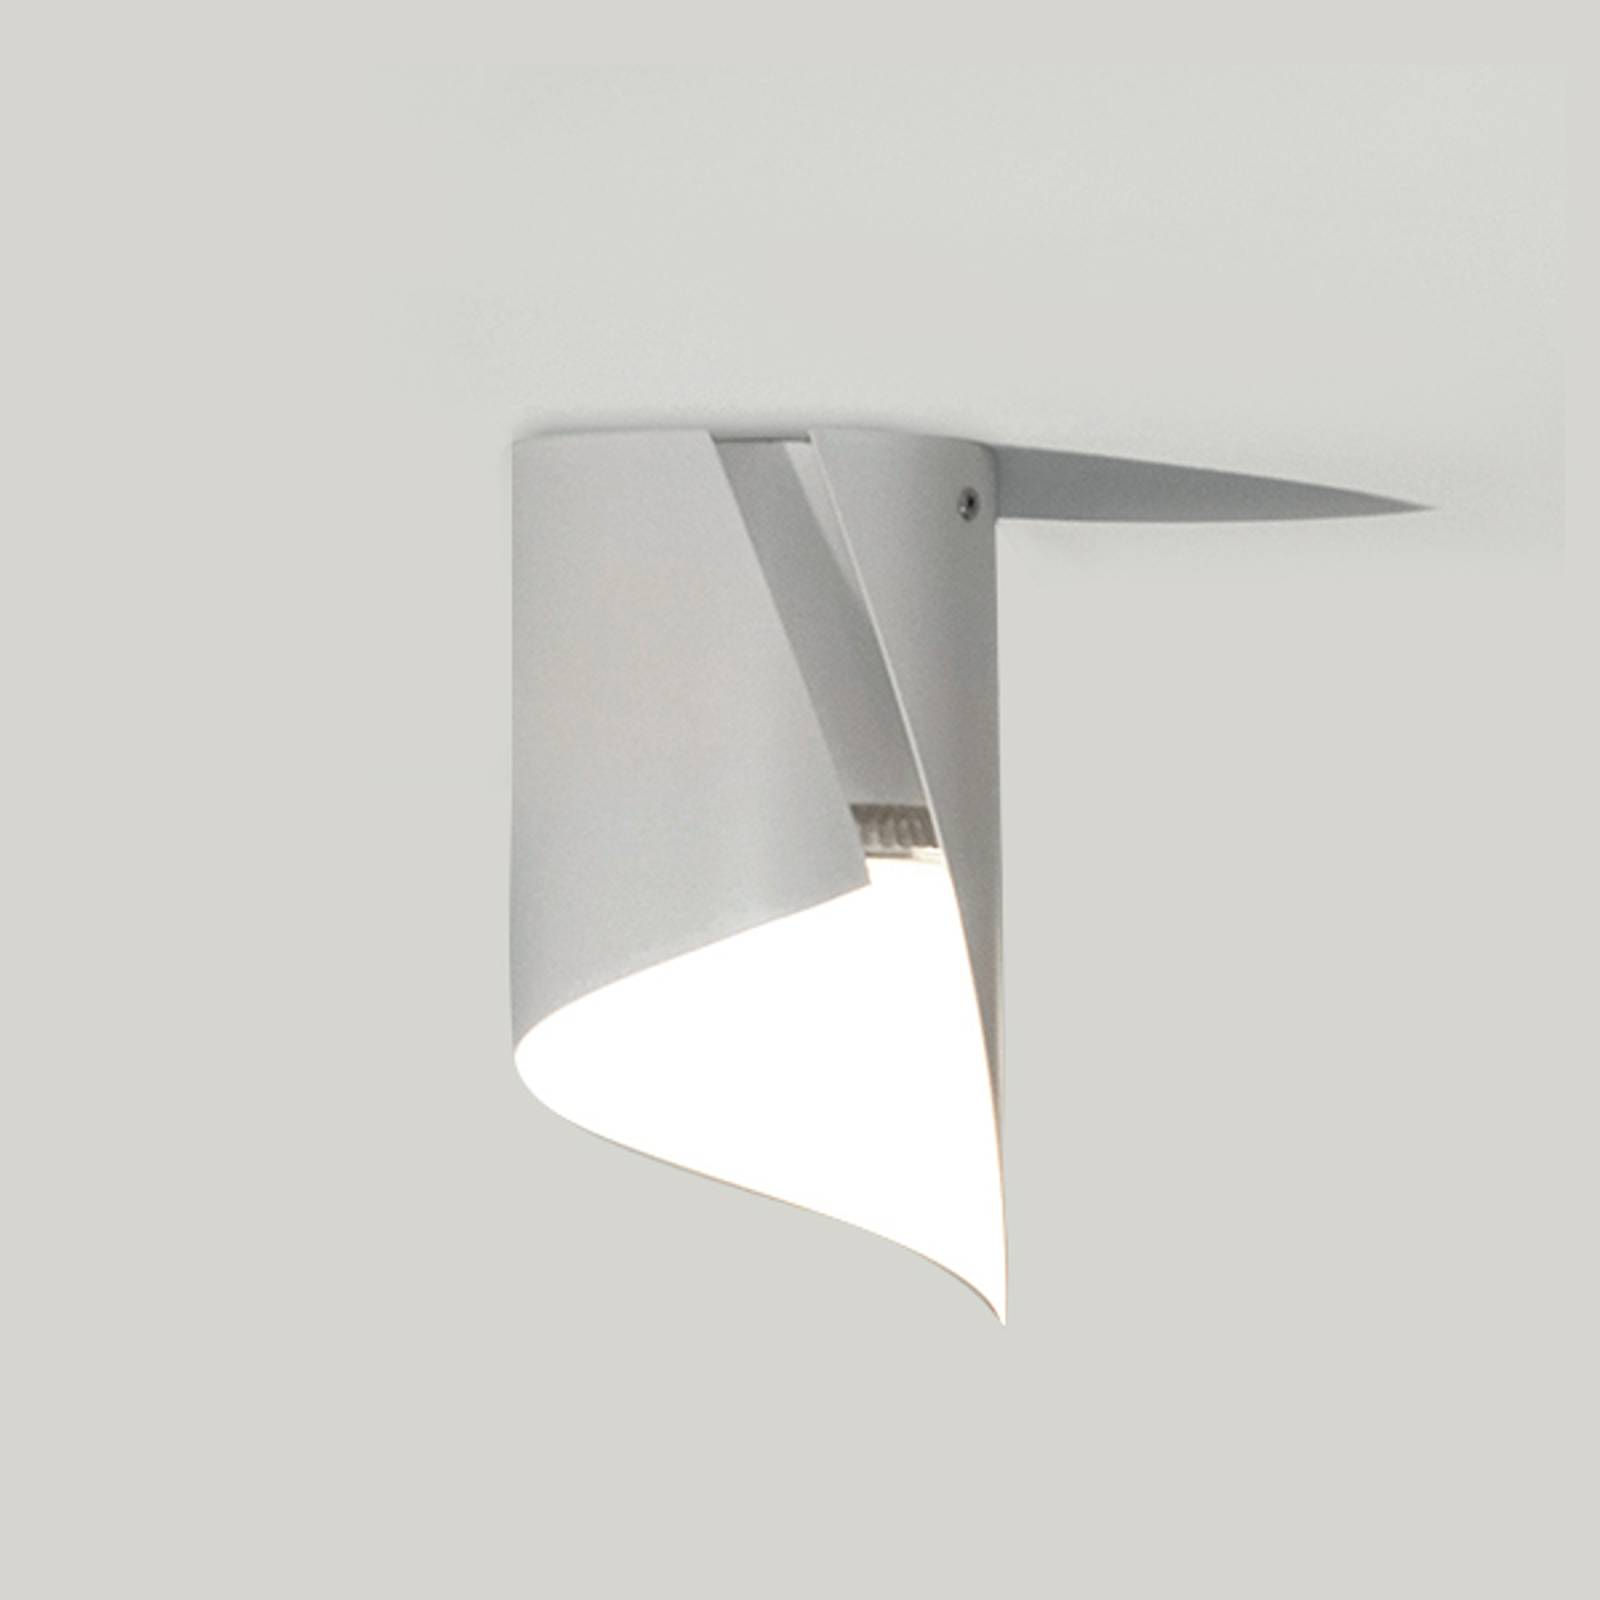 Knikerboker Hué -LED-kattolamppu 8x15 cm valkoinen